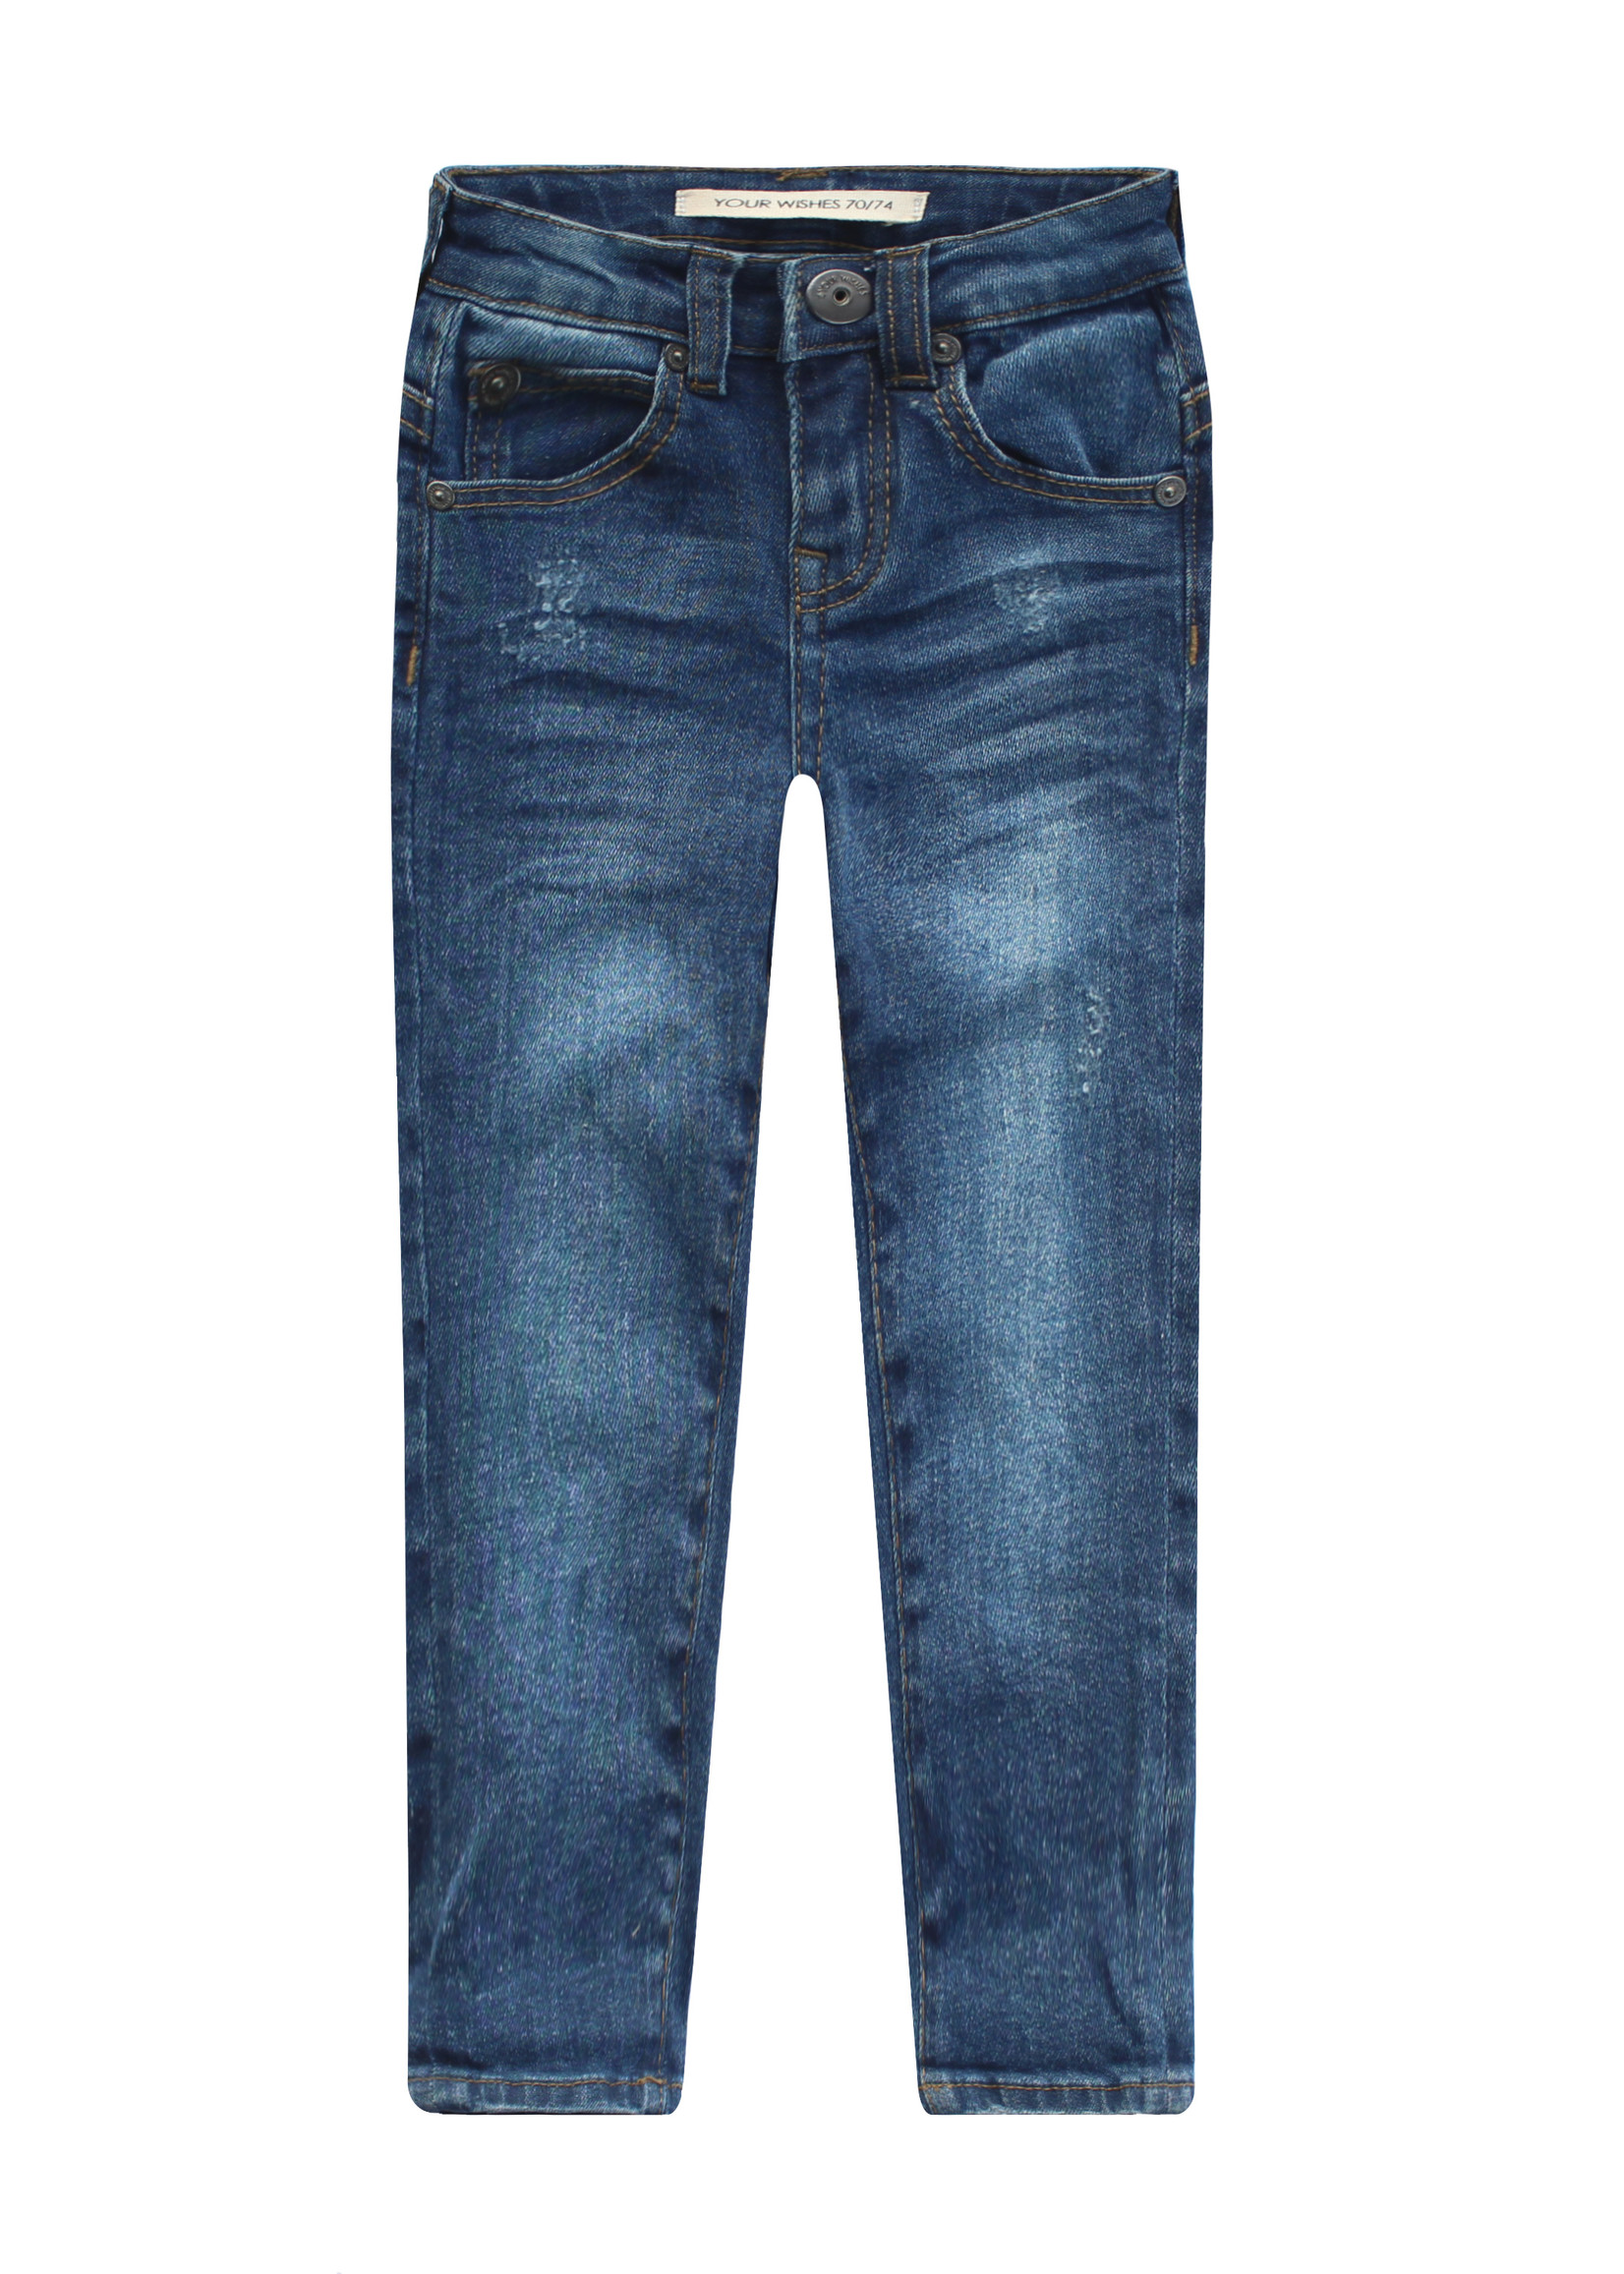 Your Wishes YW - Denim | Slim Fit Jeans Denim Medium Blue